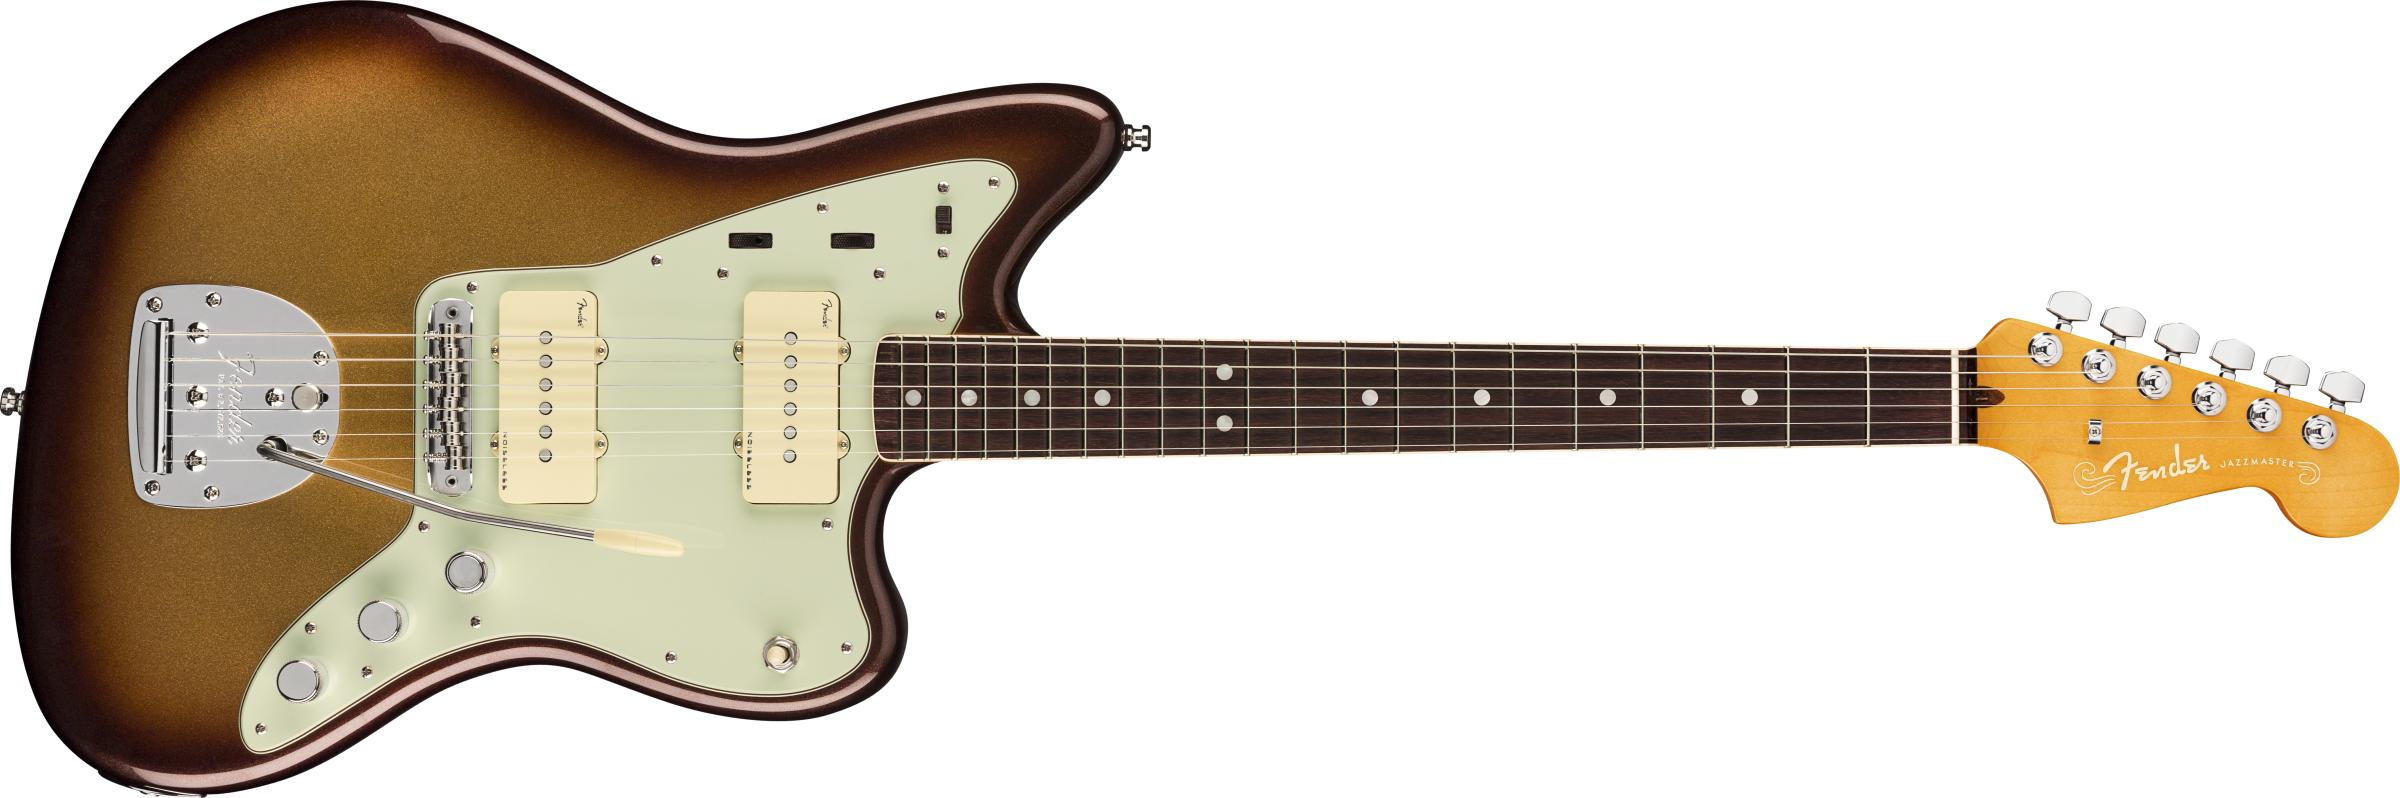 FENDER-American-Ultra-Jazzmaster-Rosewood-Fingerboard-Mocha-Burst-sku-571004109